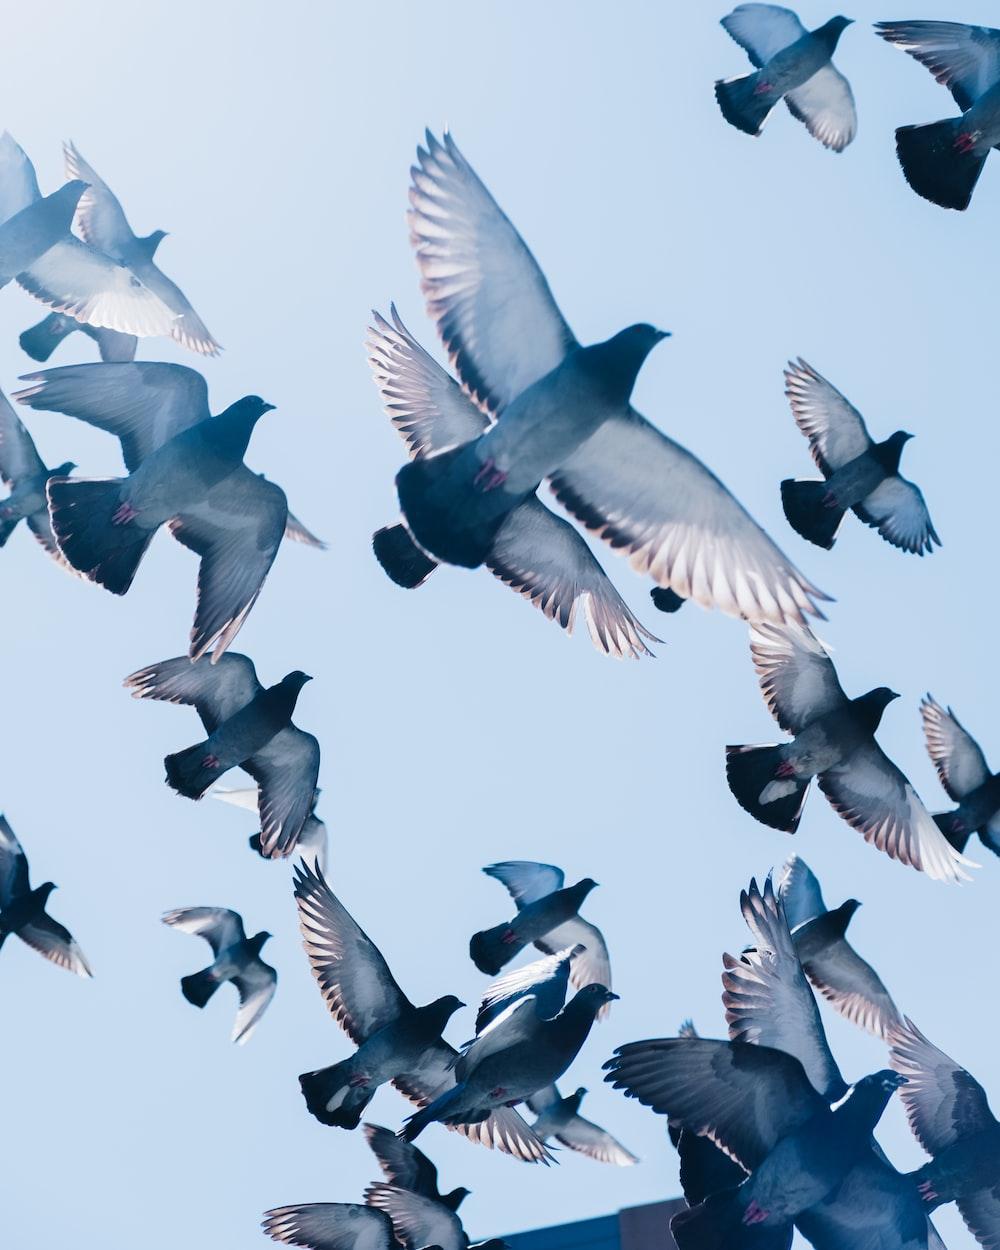 gray pigeons flying under blue sky